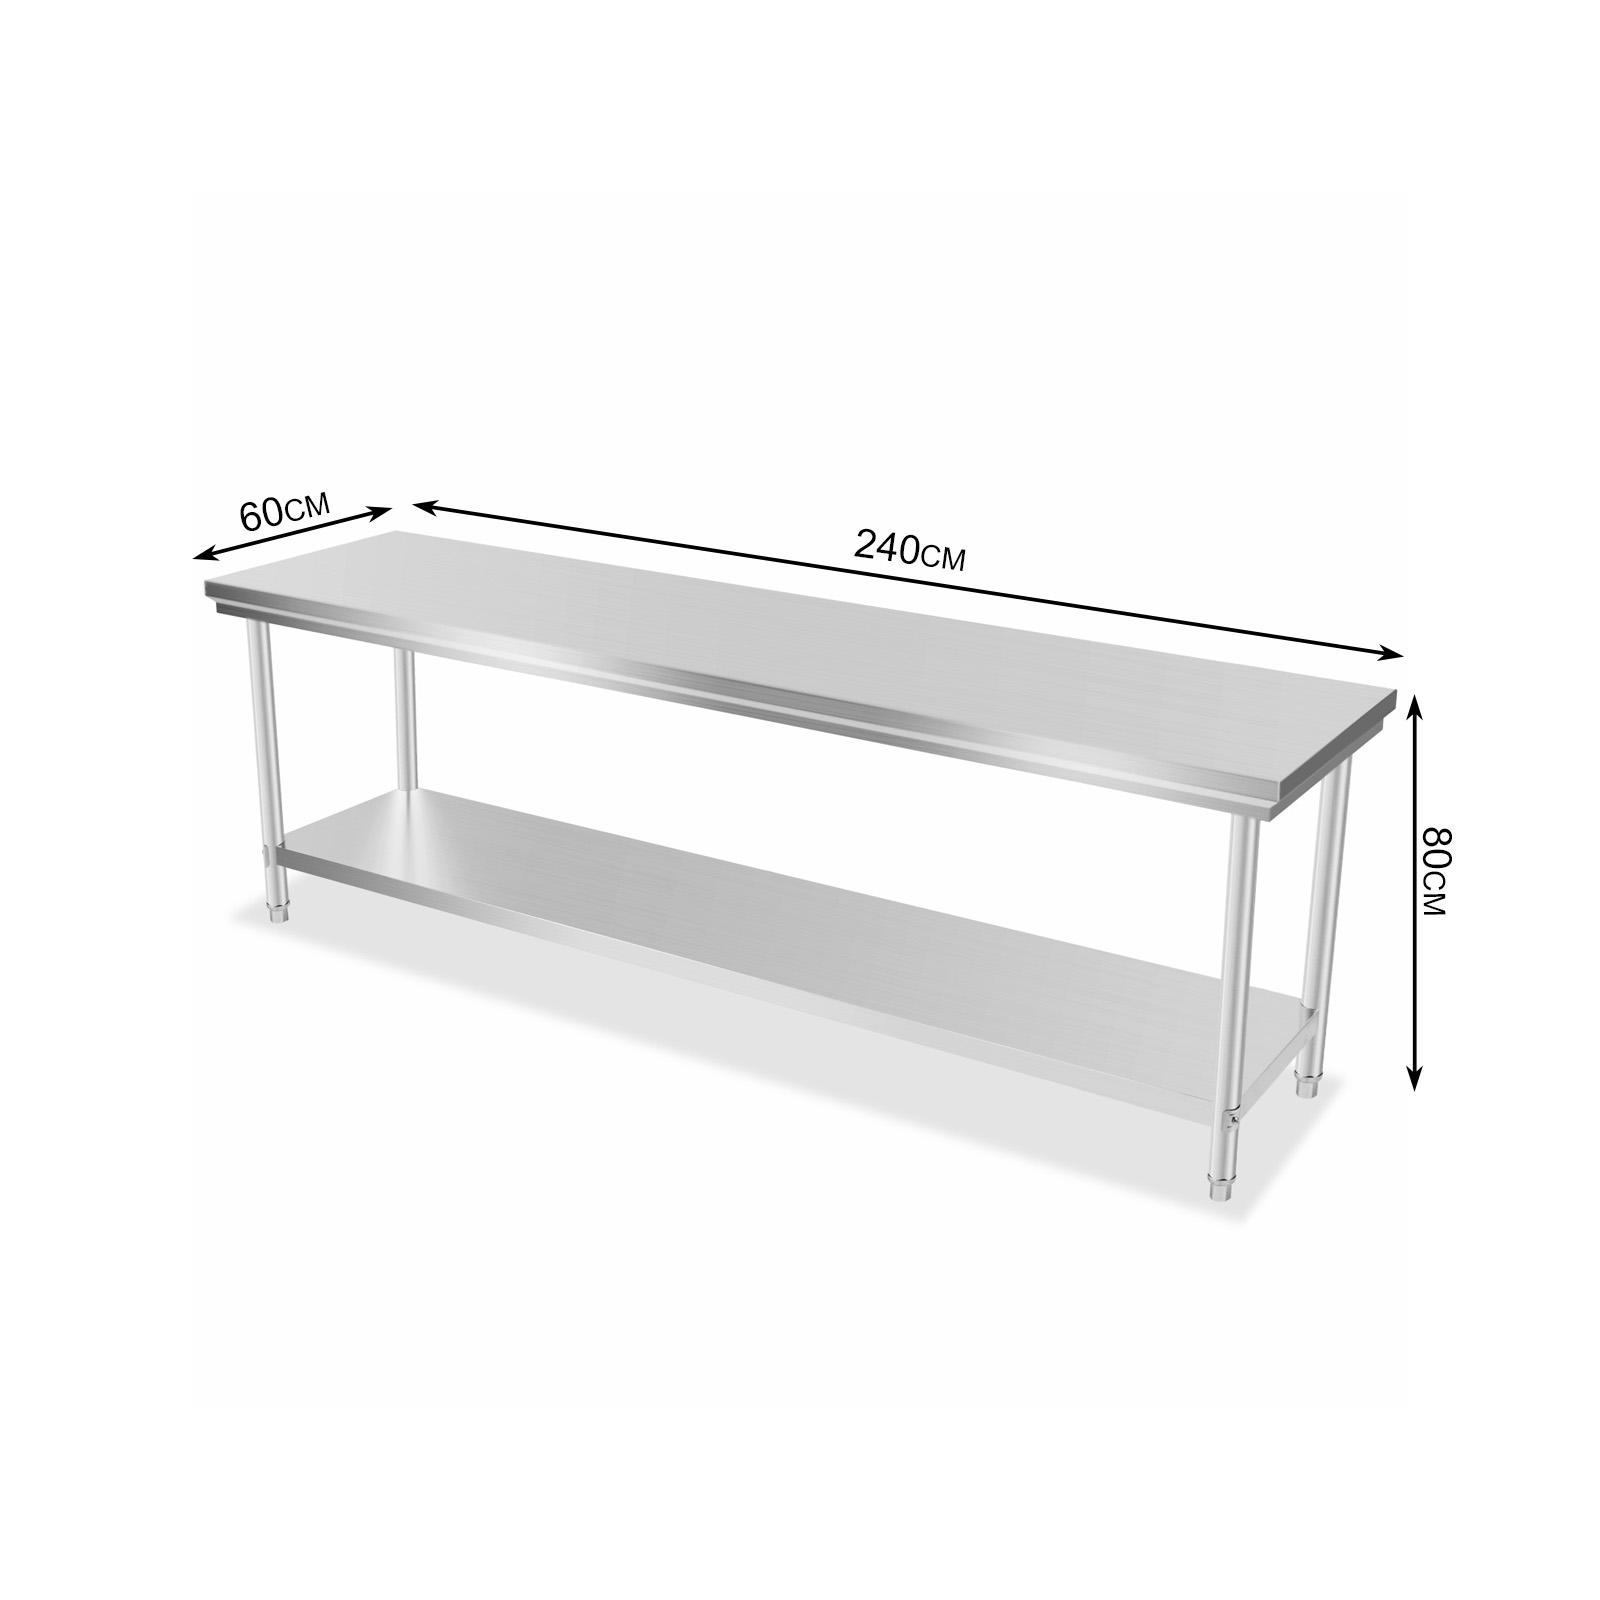 610x2438mm Kitchen Work Prep Table NSF Prep Sink Food